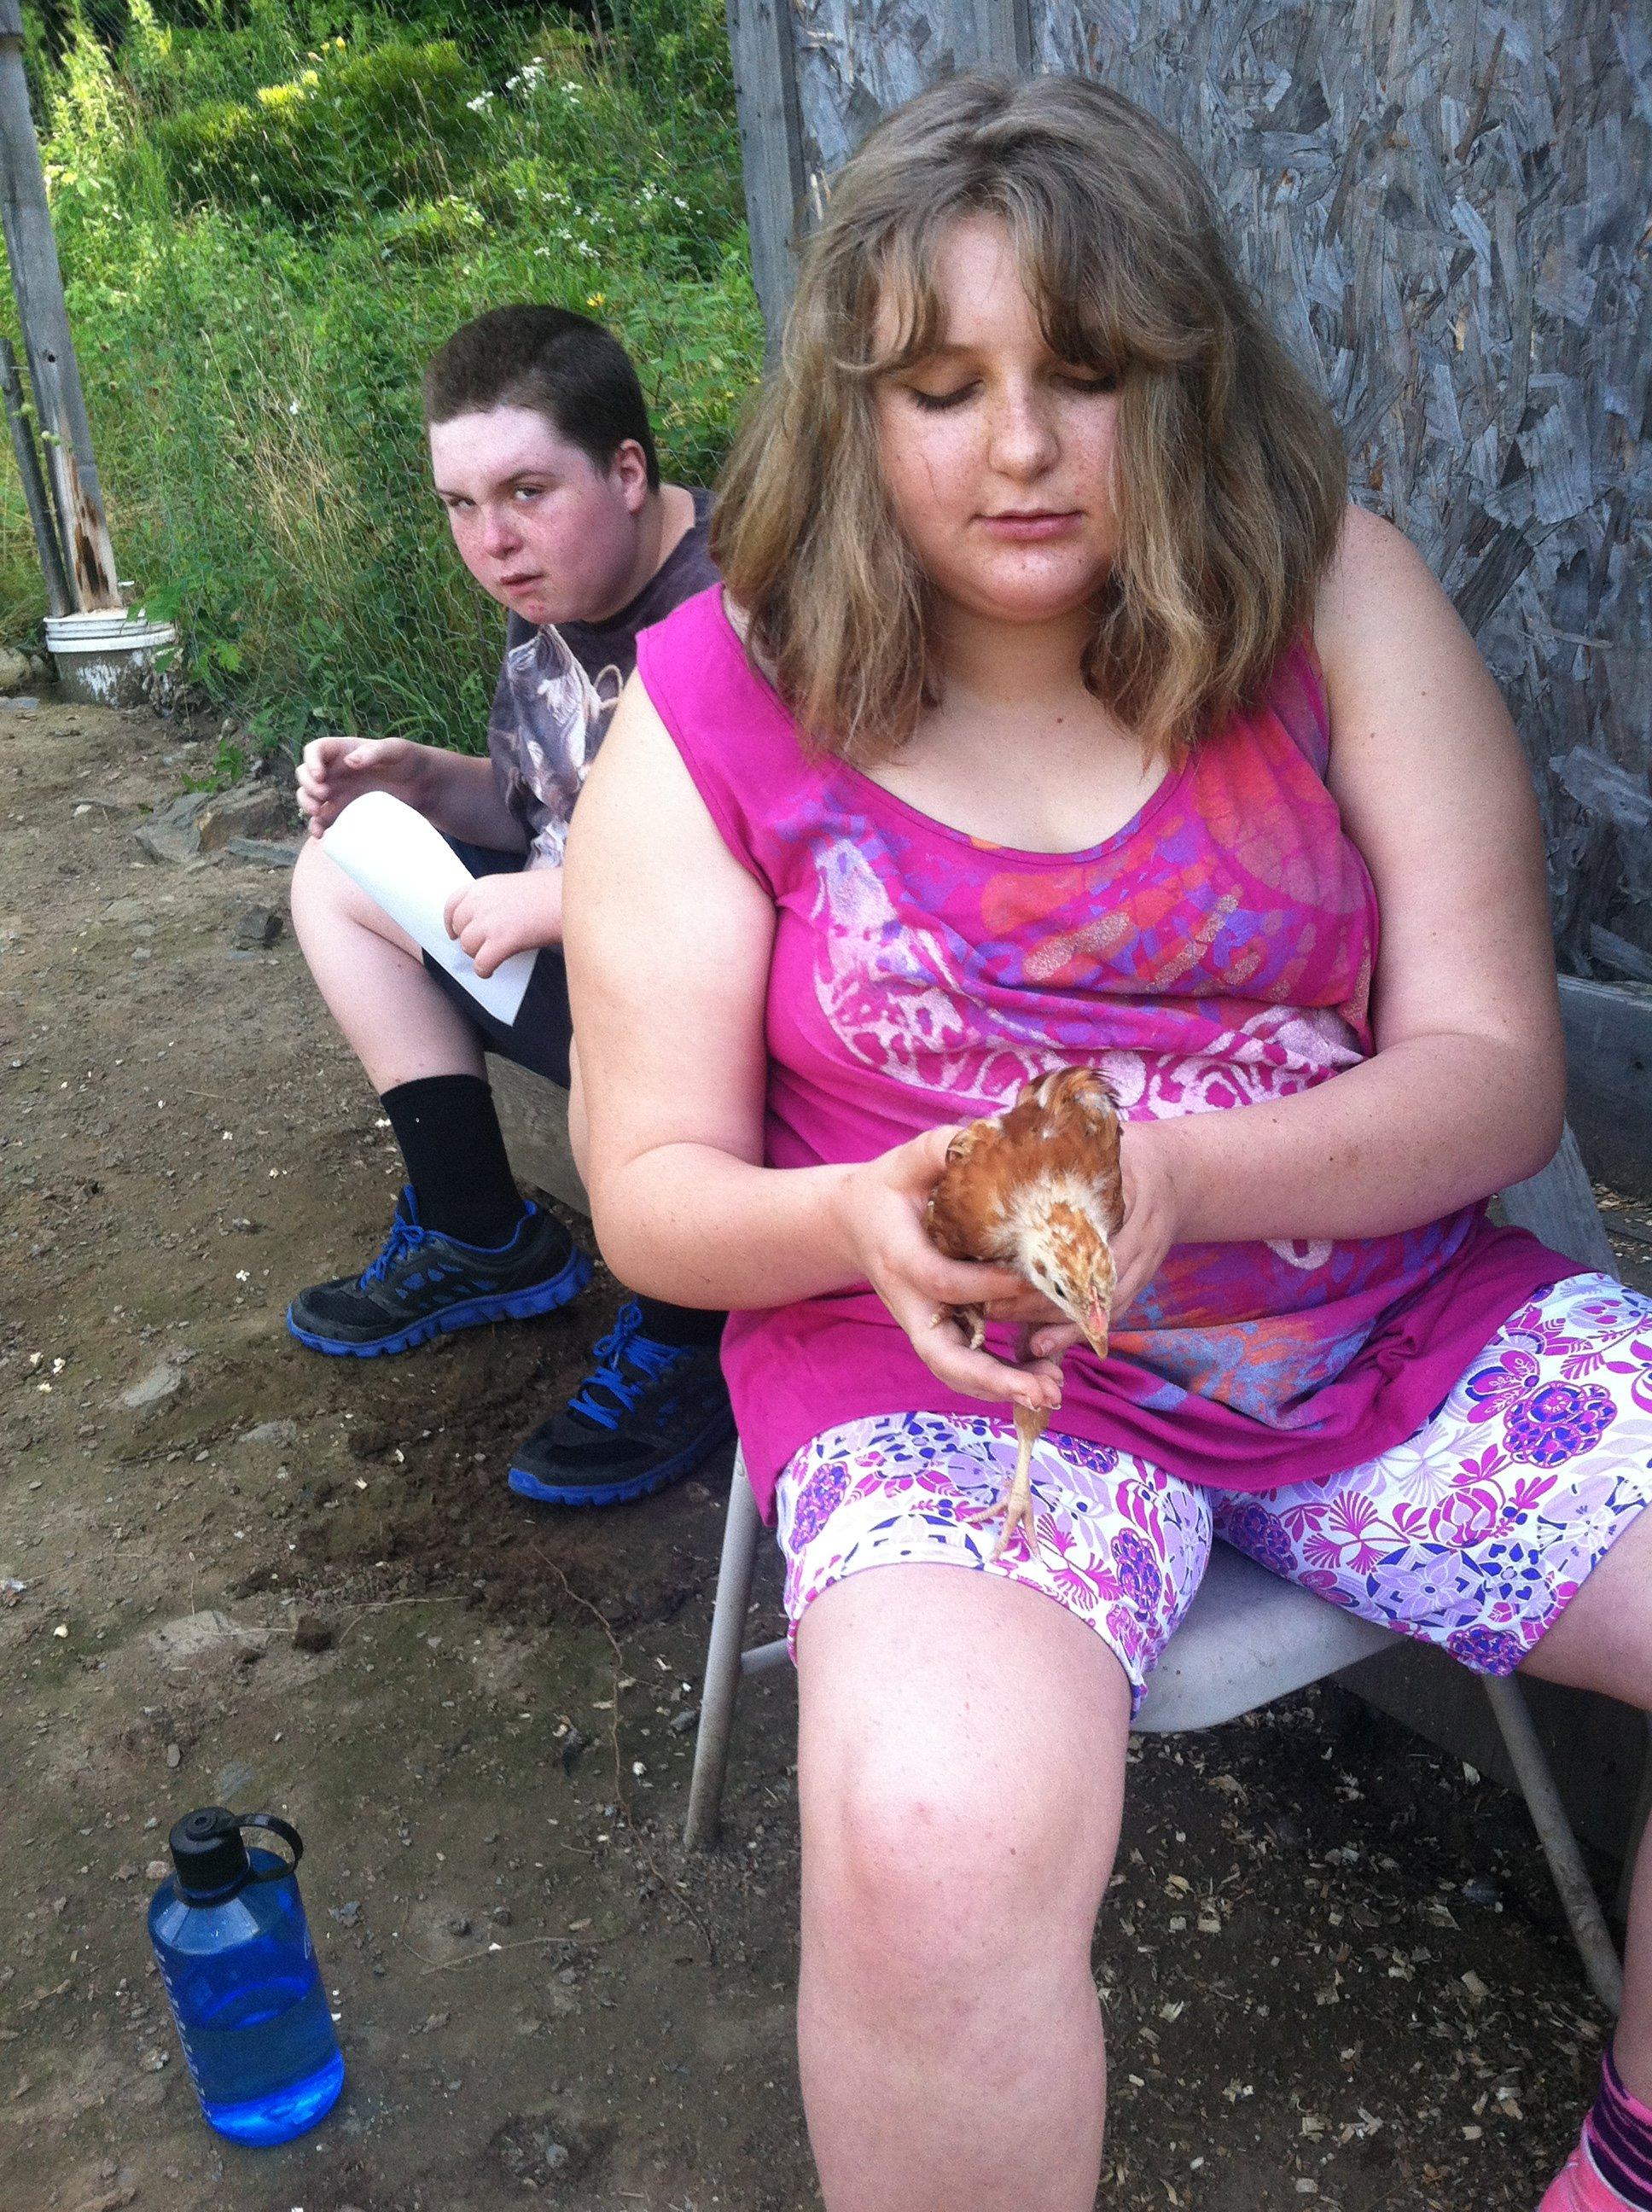 kristen-bonding-with-new-chick